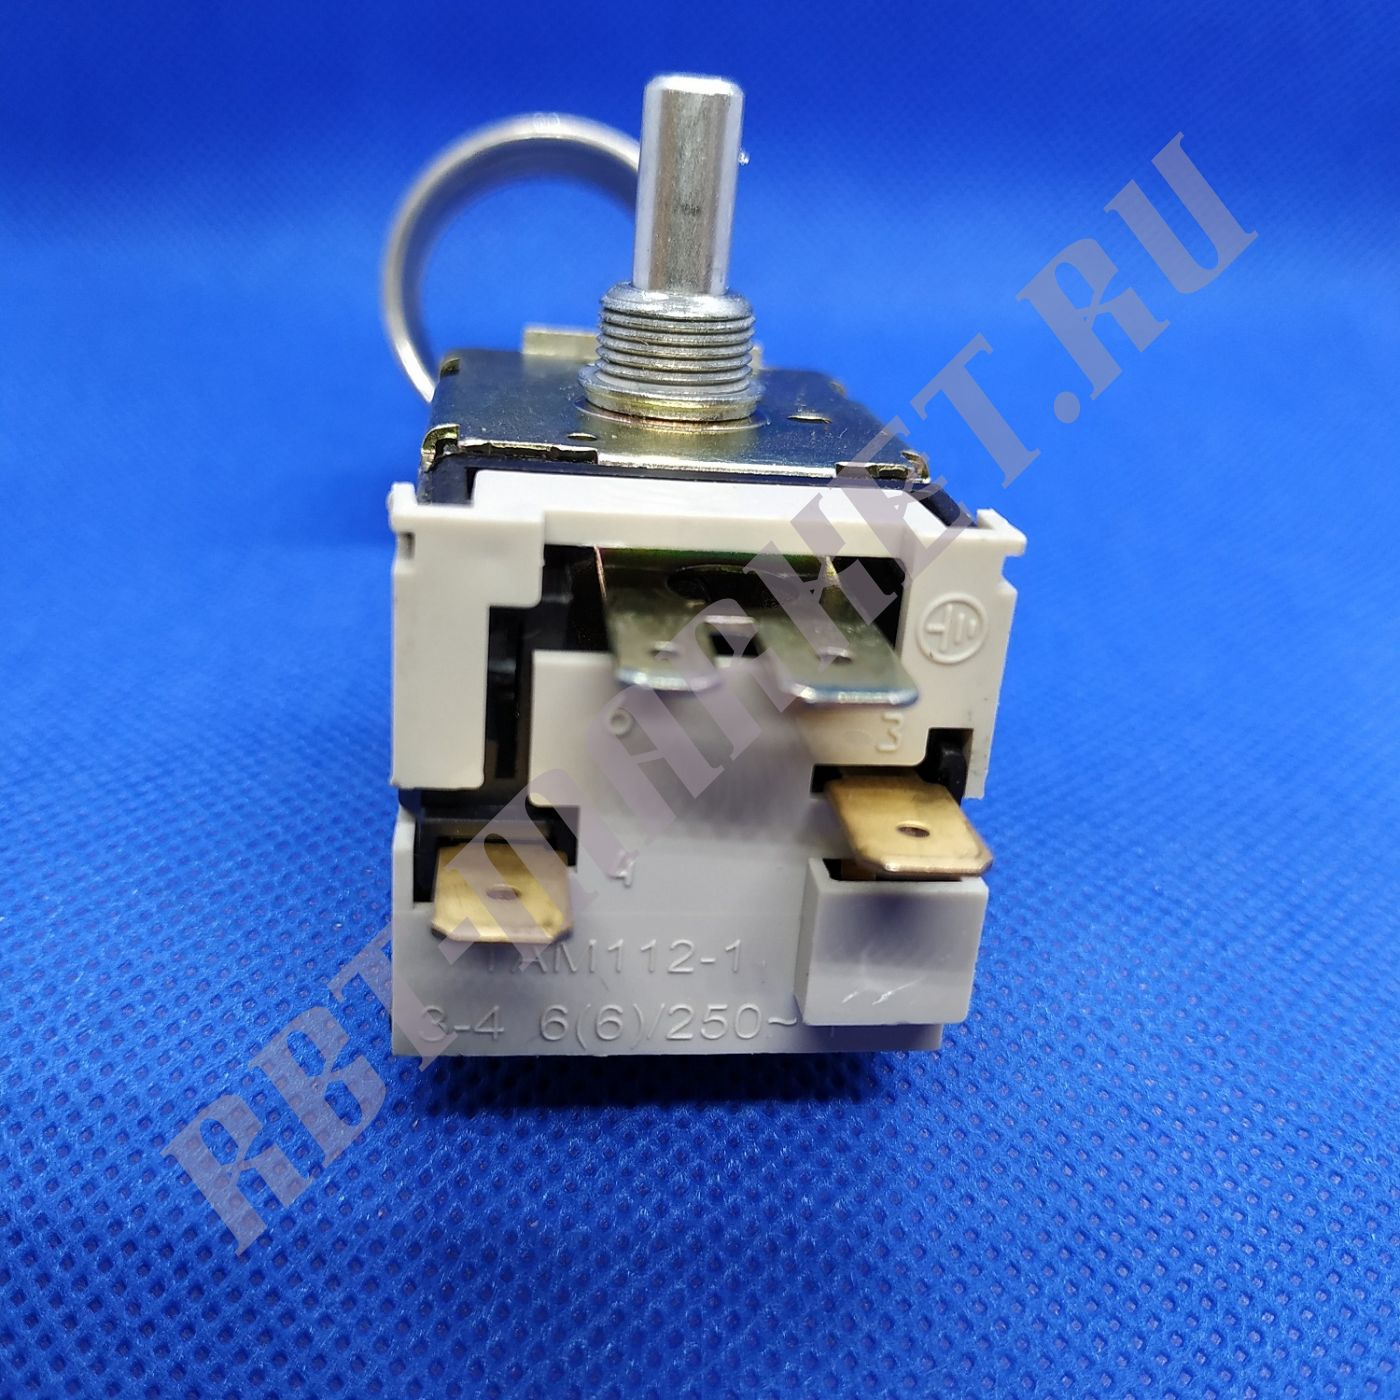 Термостат для холодильника ТАМ-112-0.8М